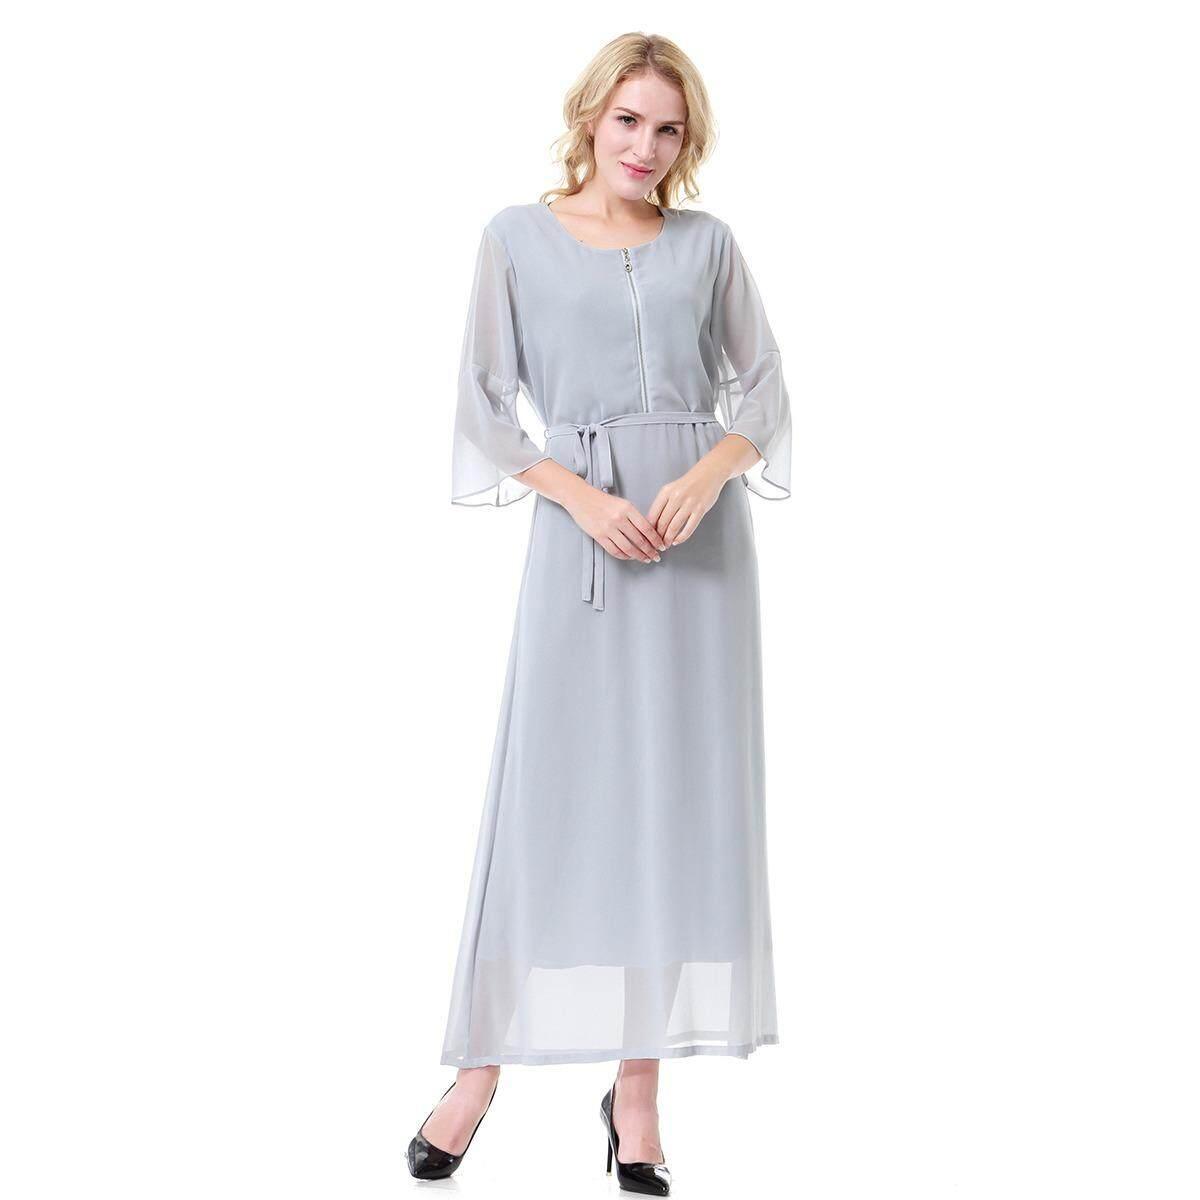 Mode Terkini Busana Wanita Muslim Ritsleting Sifon Abaya Kaftan Medium Lengan Islam Indonesia Gaun Panjang Jubah